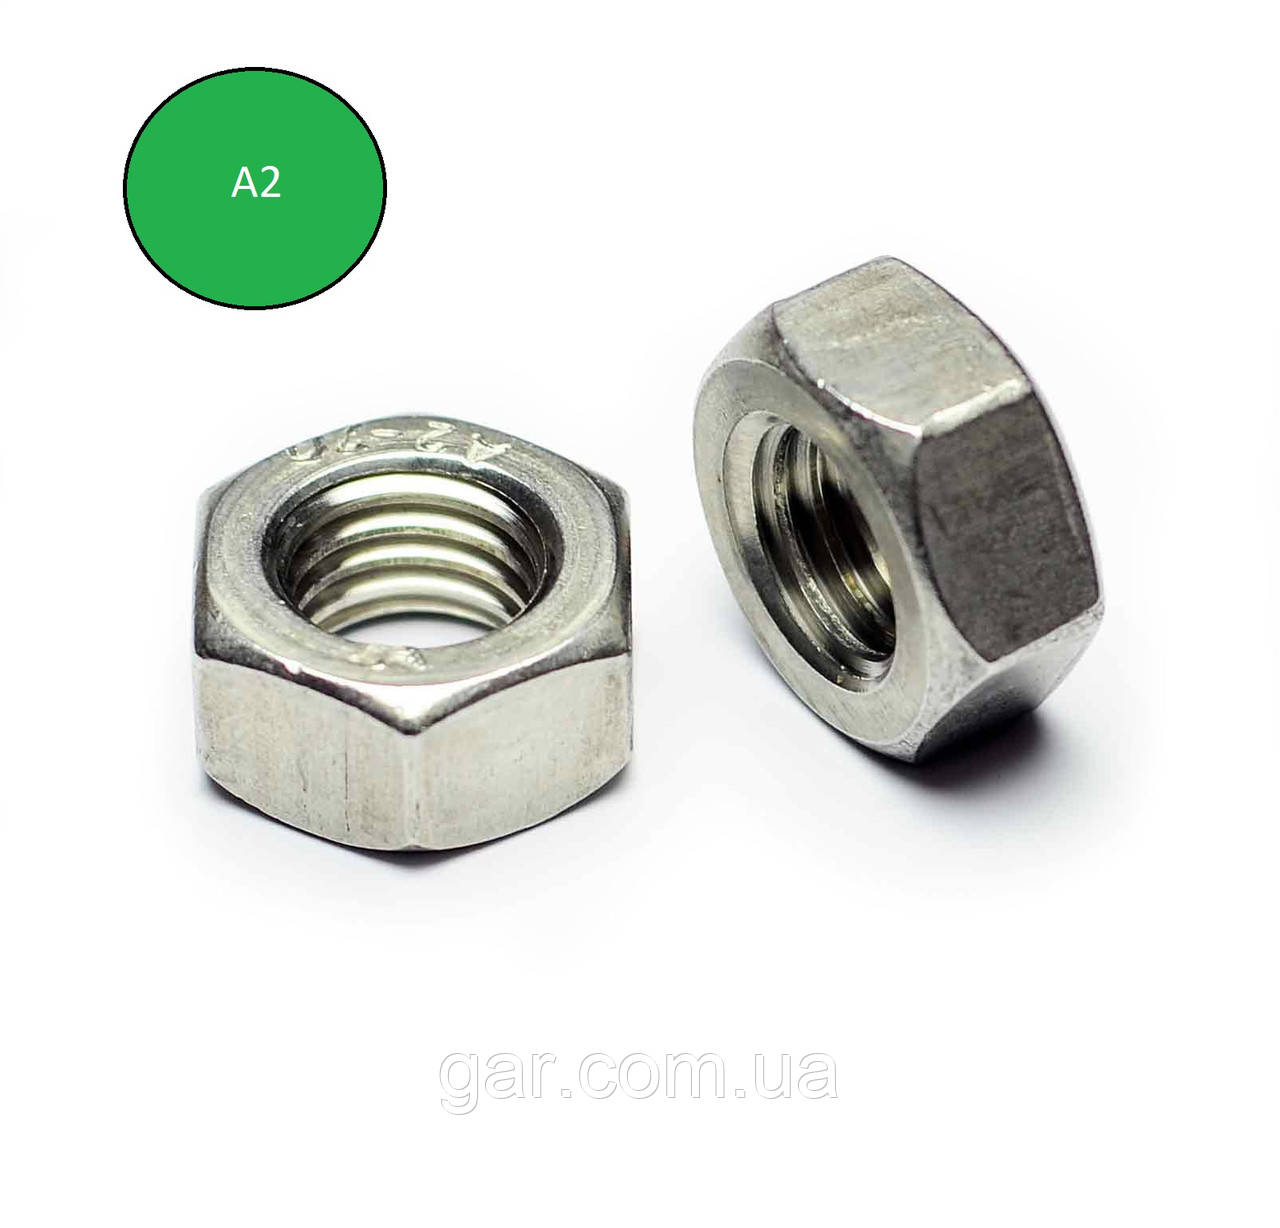 Гайка нержавеющая М1.6 DIN 934 (ГОСТ 5915-70, ГОСТ 5927-70) сталь А2 и А4